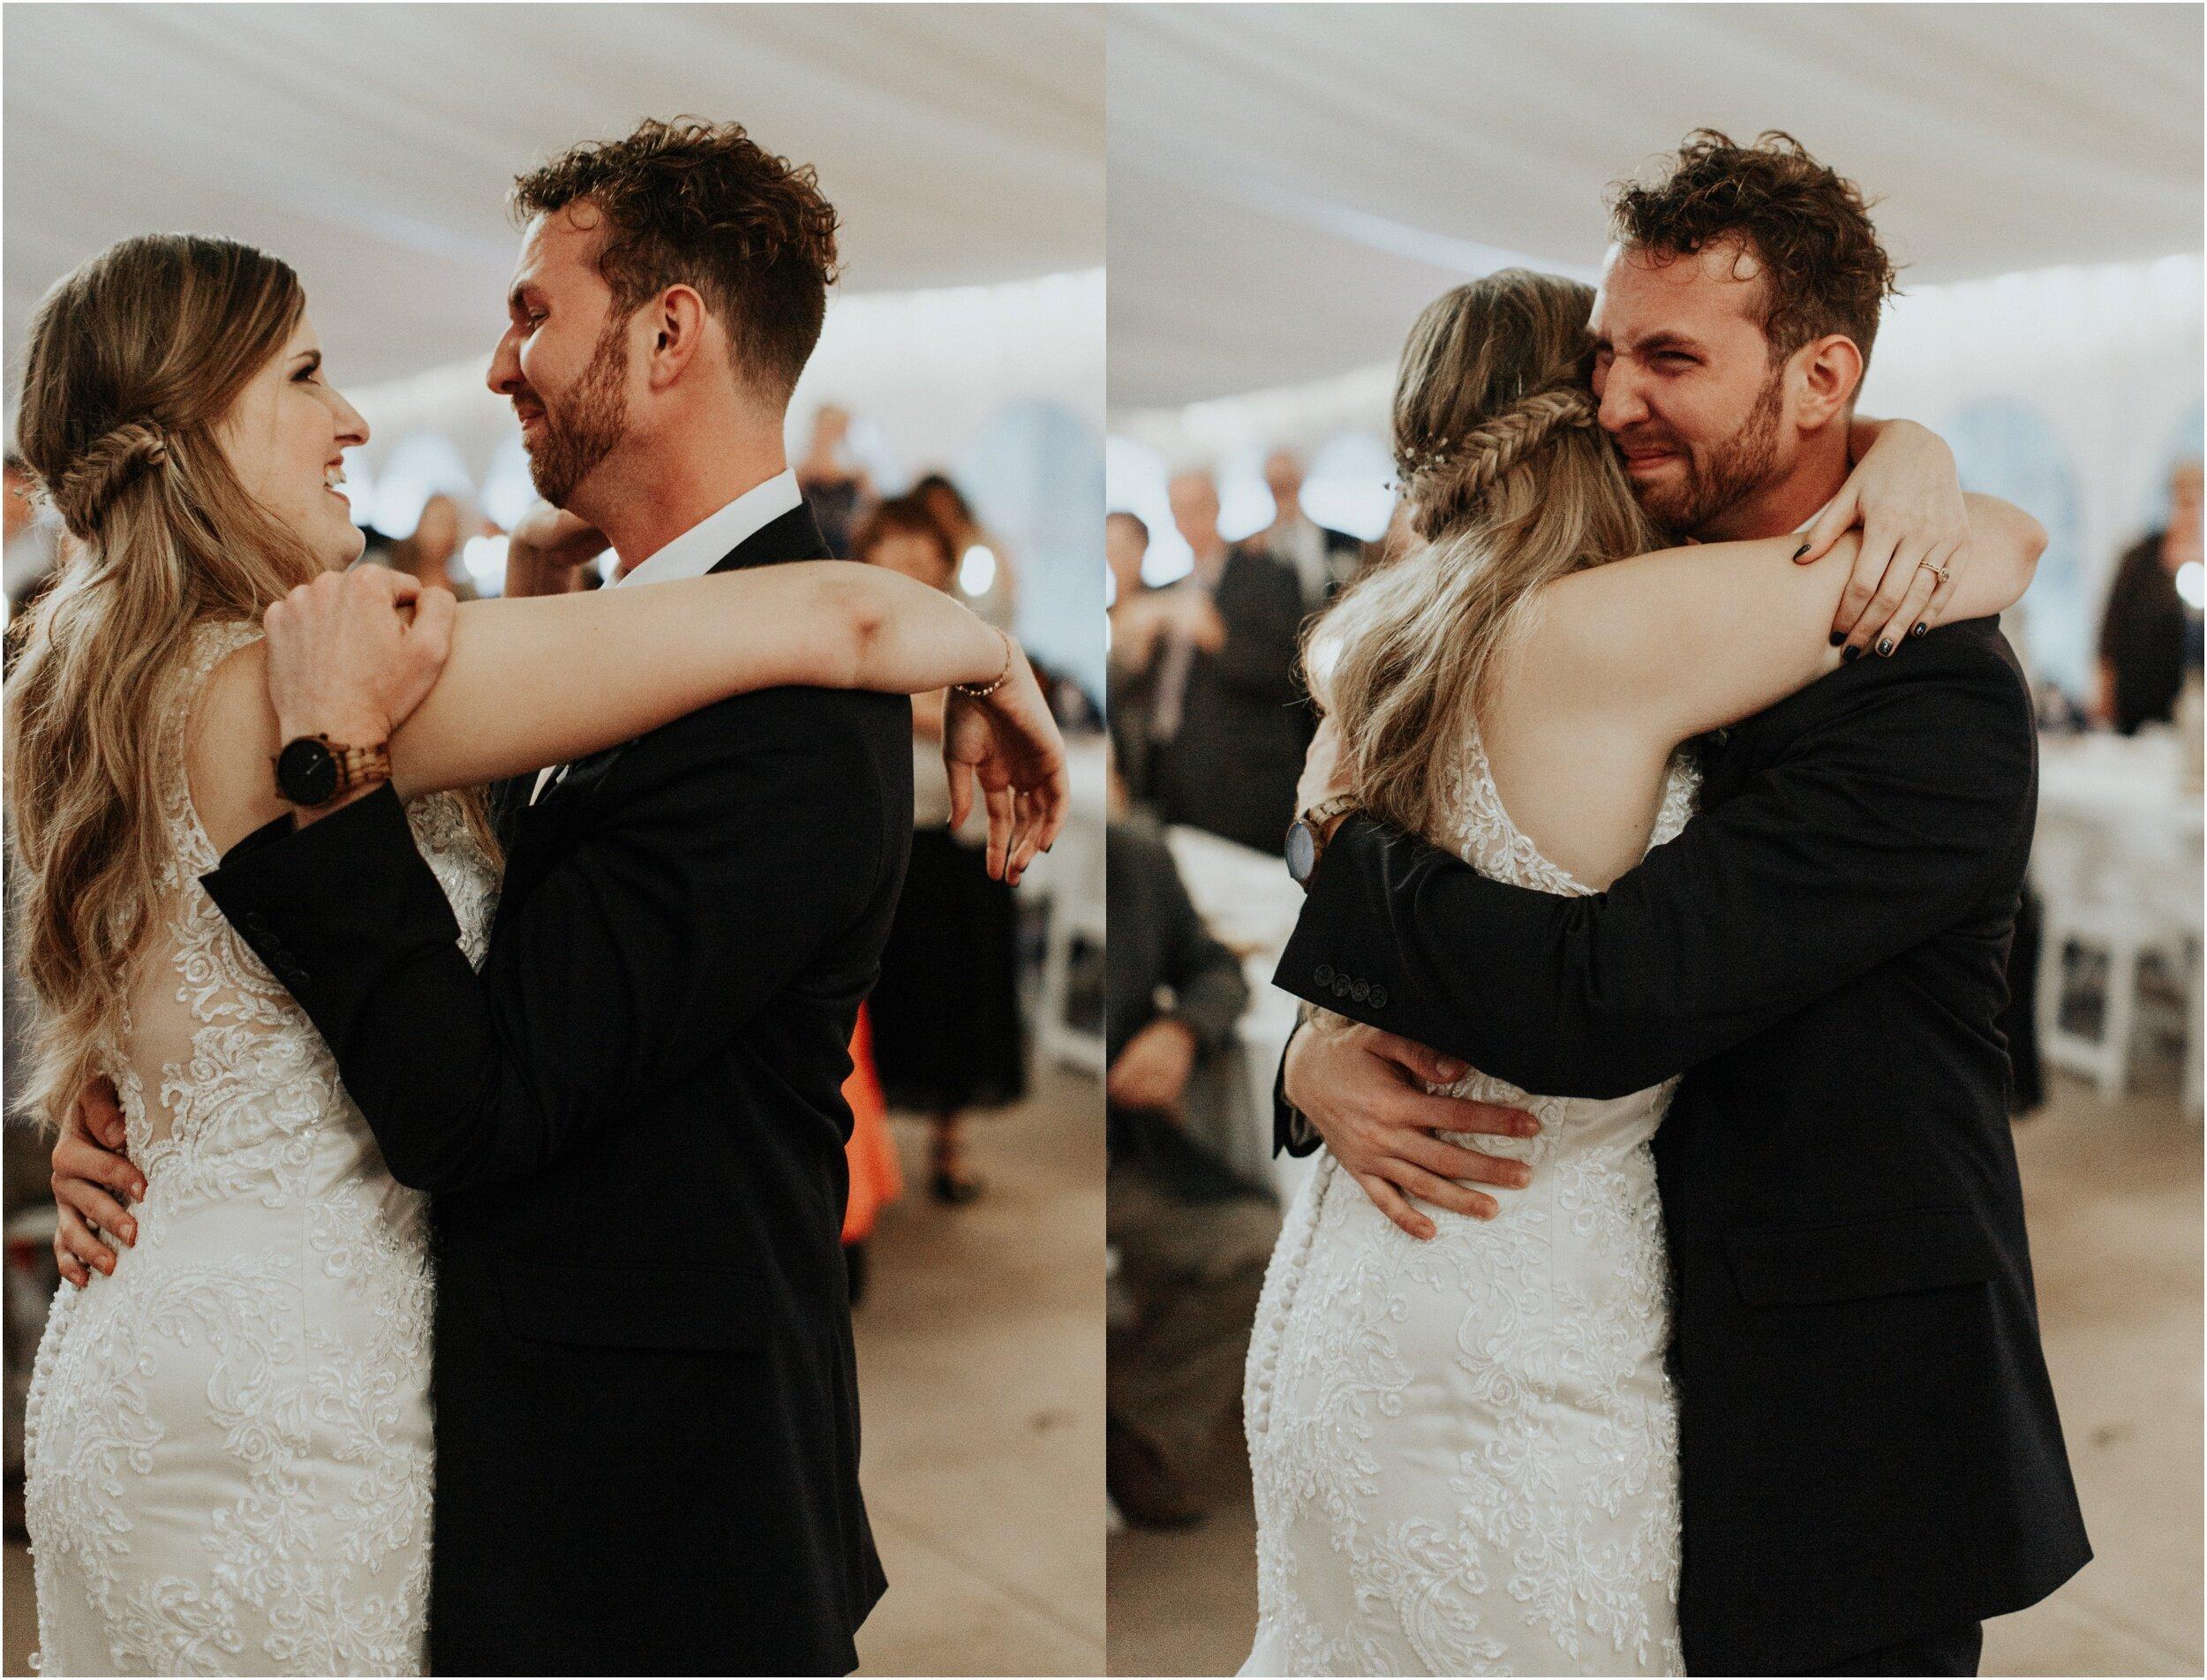 steph-and-jordan-cox-our-wedding-historic-shady-lane-compass-wedding-collective-hazel-lining-photography-destination-elopement-wedding-engagement-photography_0086.jpg